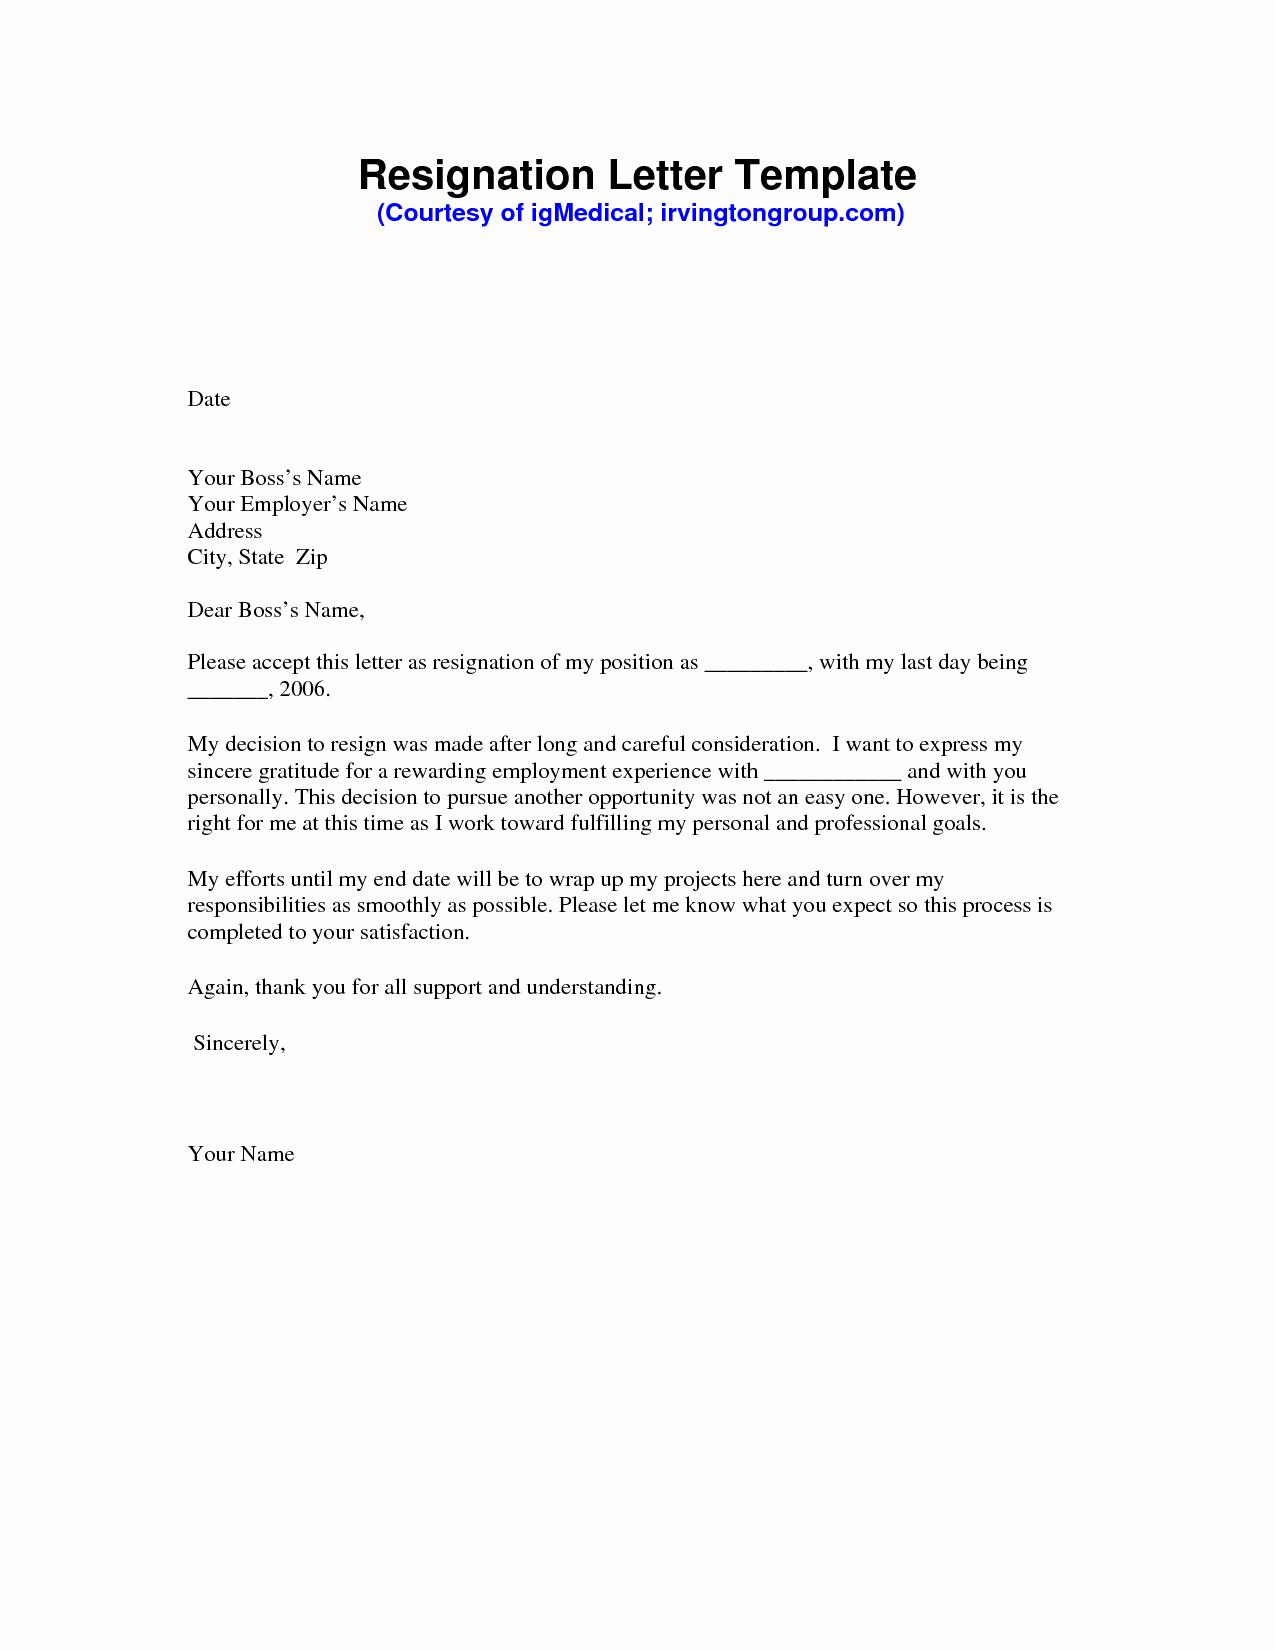 Letter Of Resignation Template Download Elegant Resignation Letter Sample Pdf